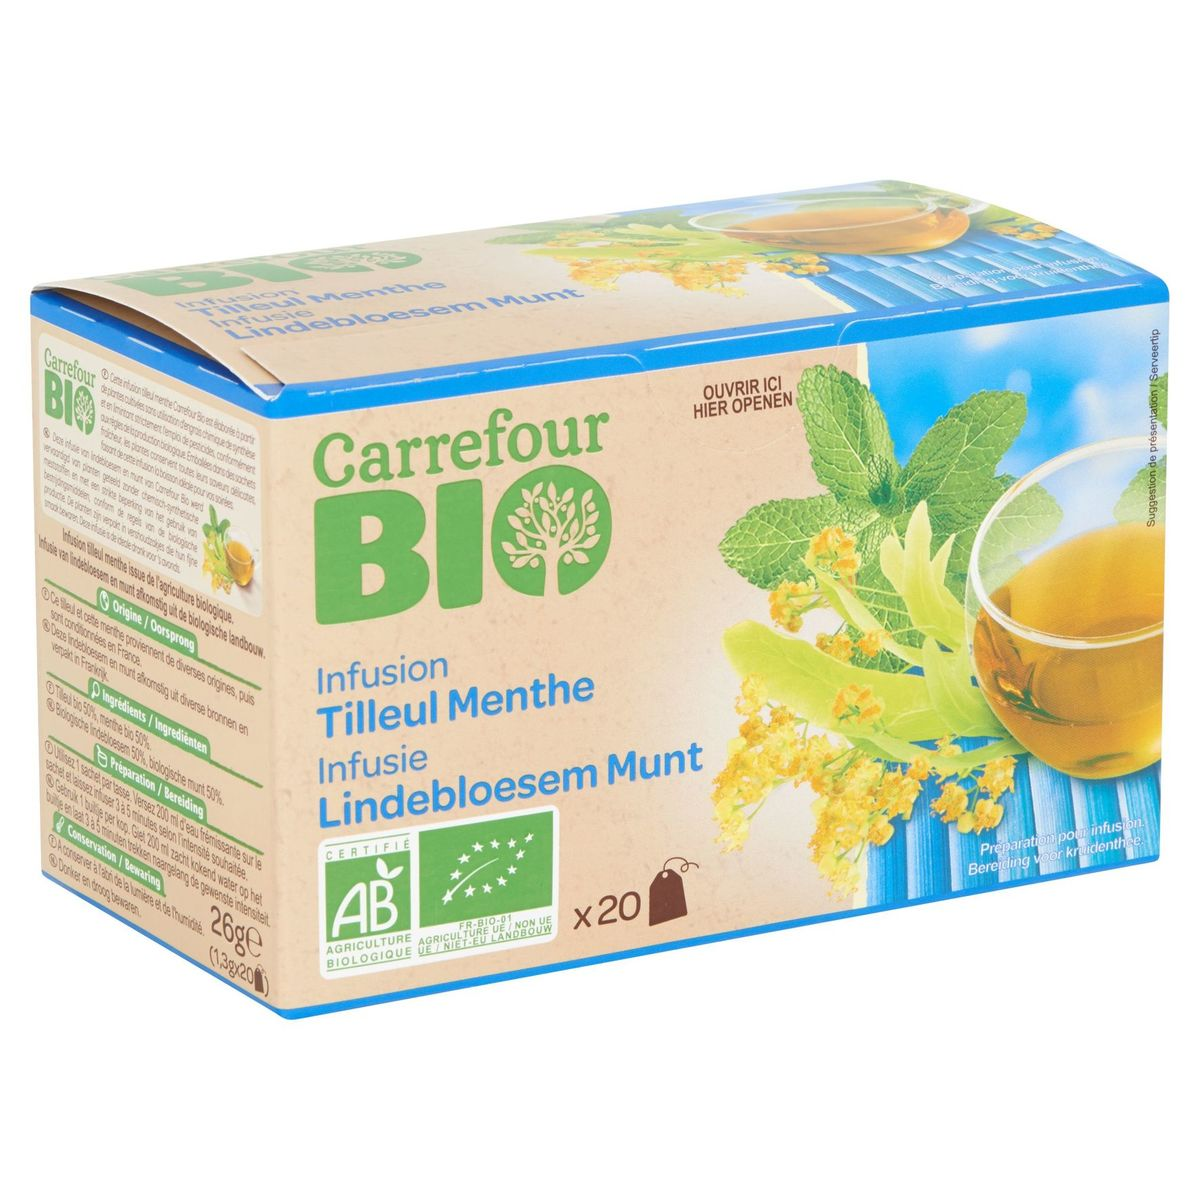 Carrefour Bio Infusion Tilleul Menthe Sachets 20 x 1.3 g